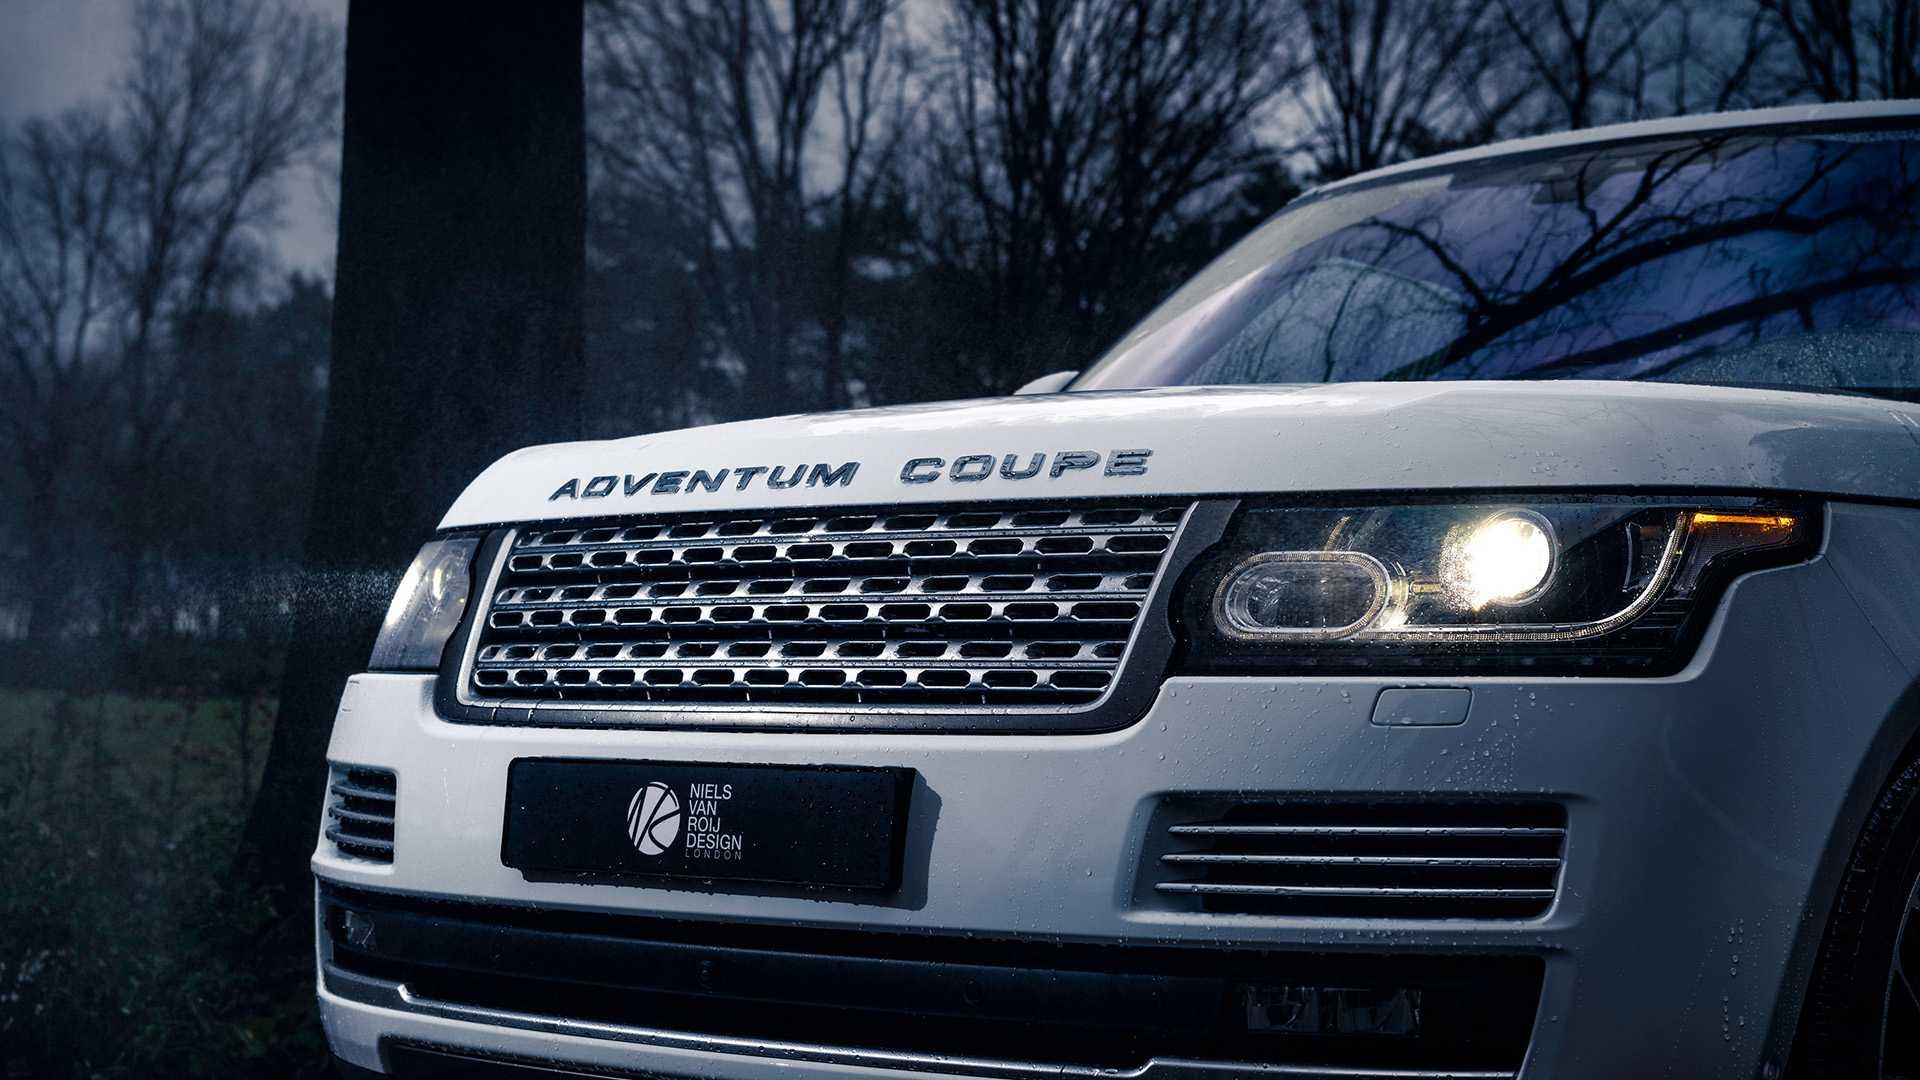 Range Rover Adventum Coupé